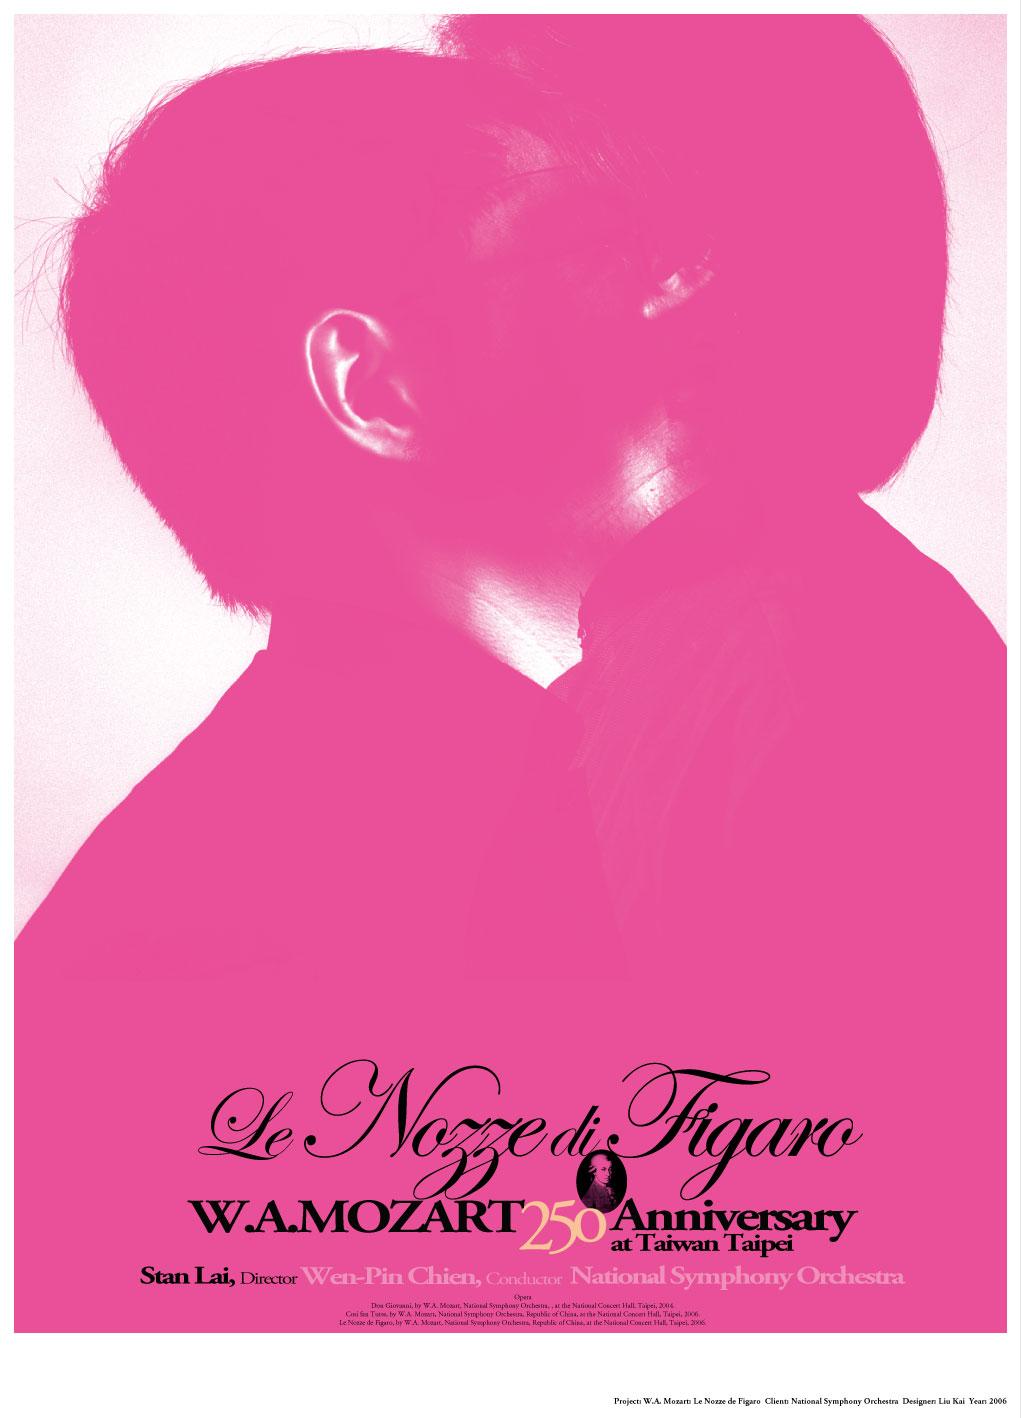 2006【費加洛的婚禮】 W.A. Mozart Le Nozze de Figaro